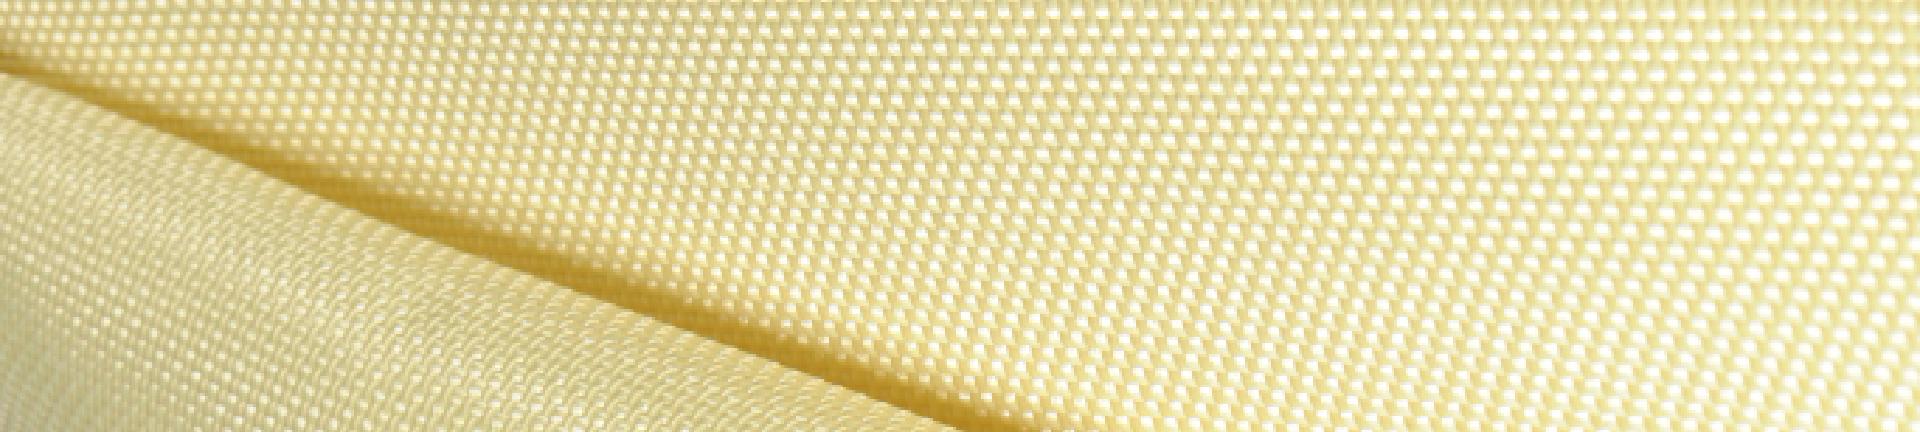 Chomarat™ Renforts Composites